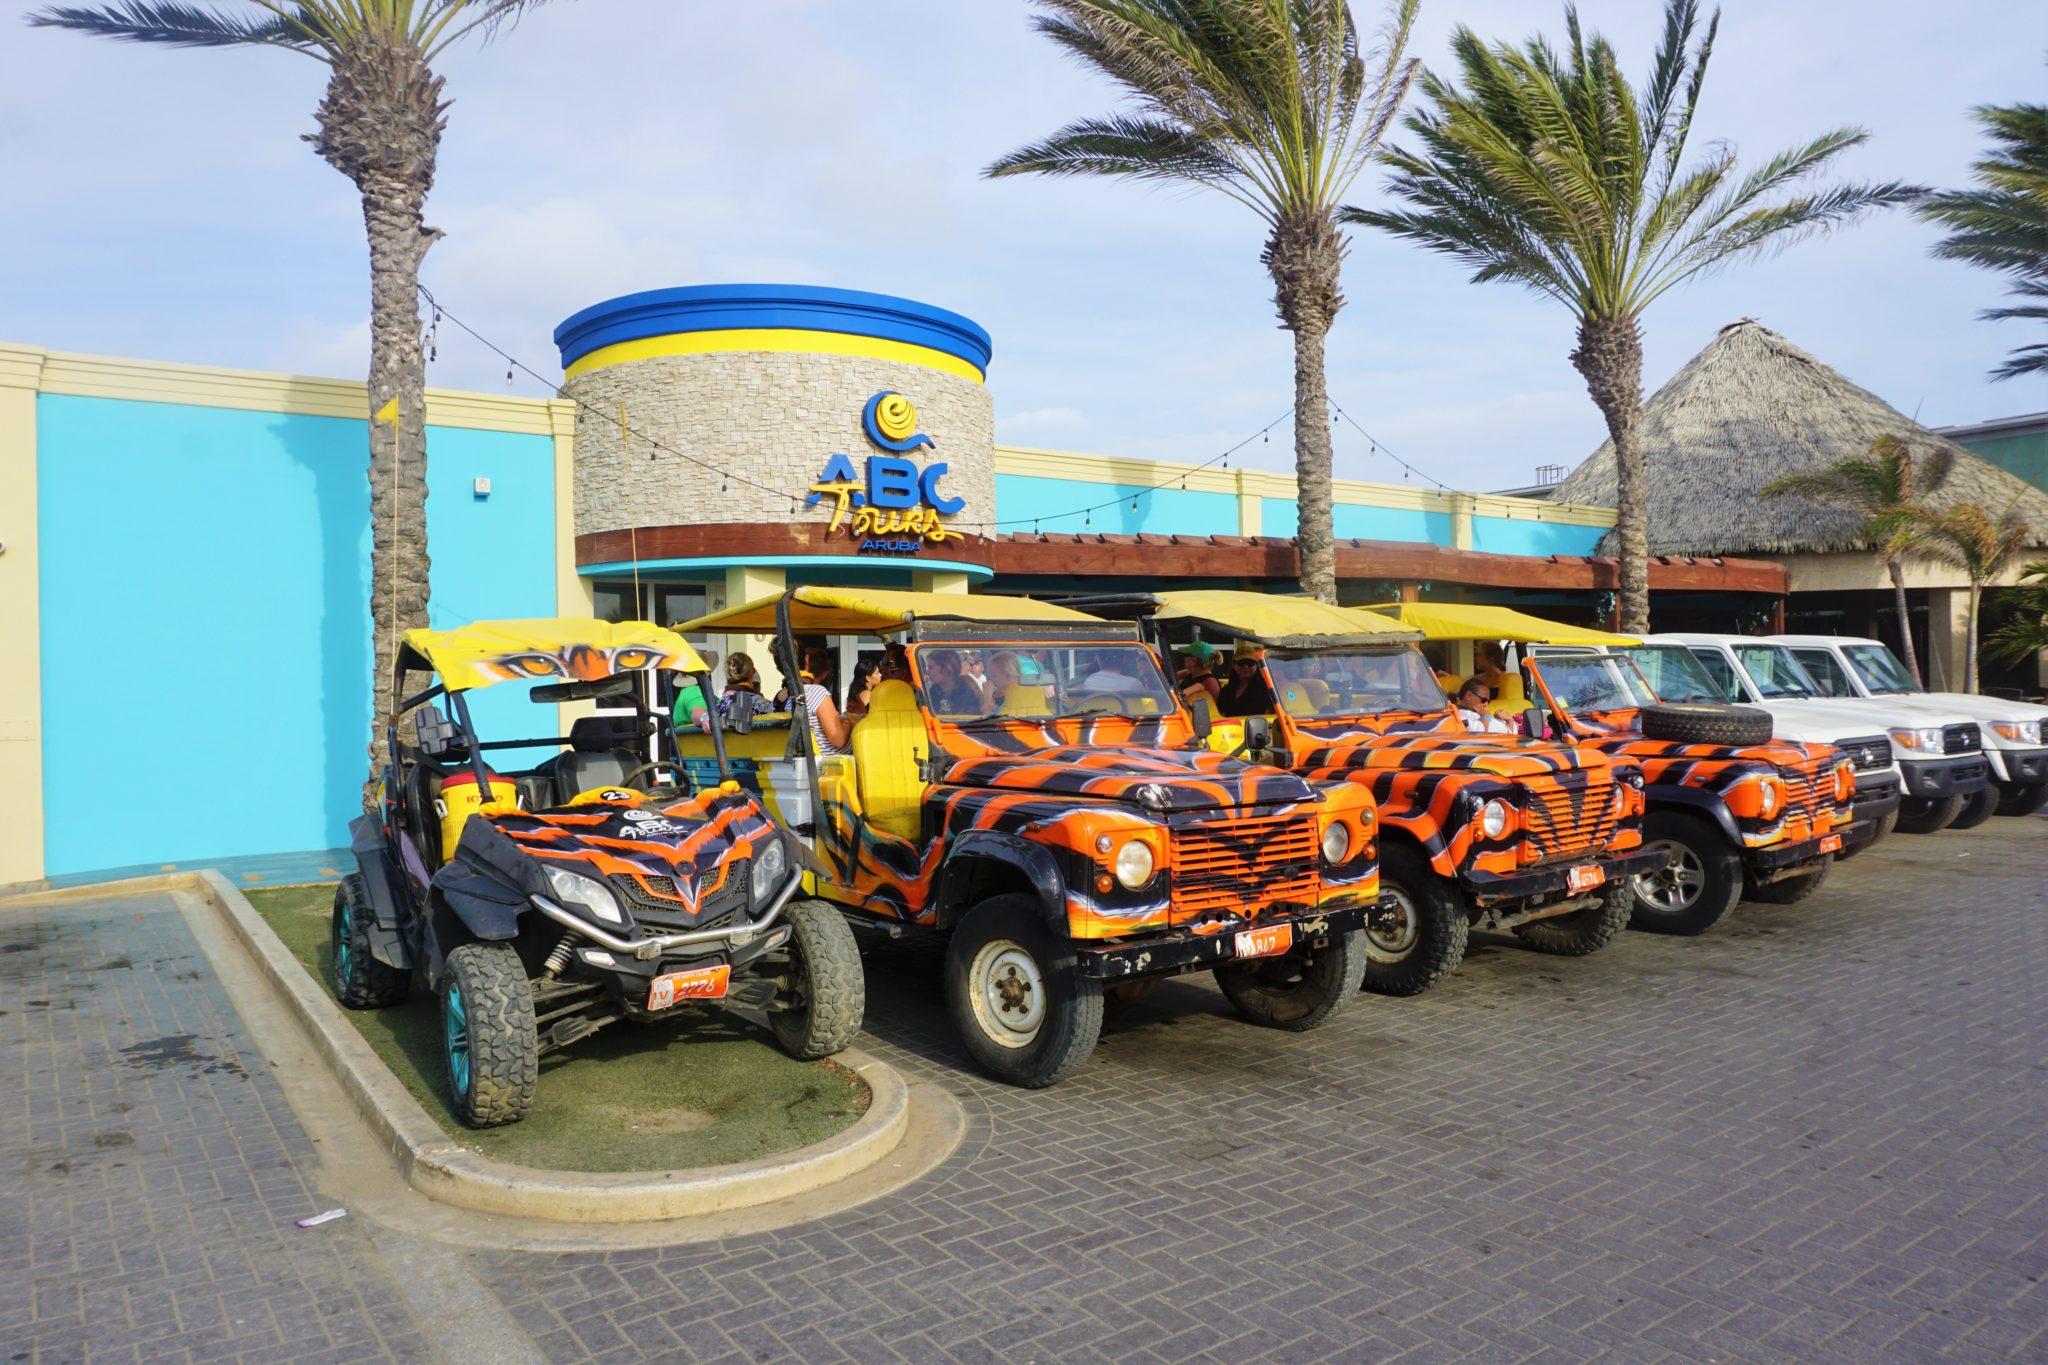 ABC Tours Aruba Island Ultimate Safari Review